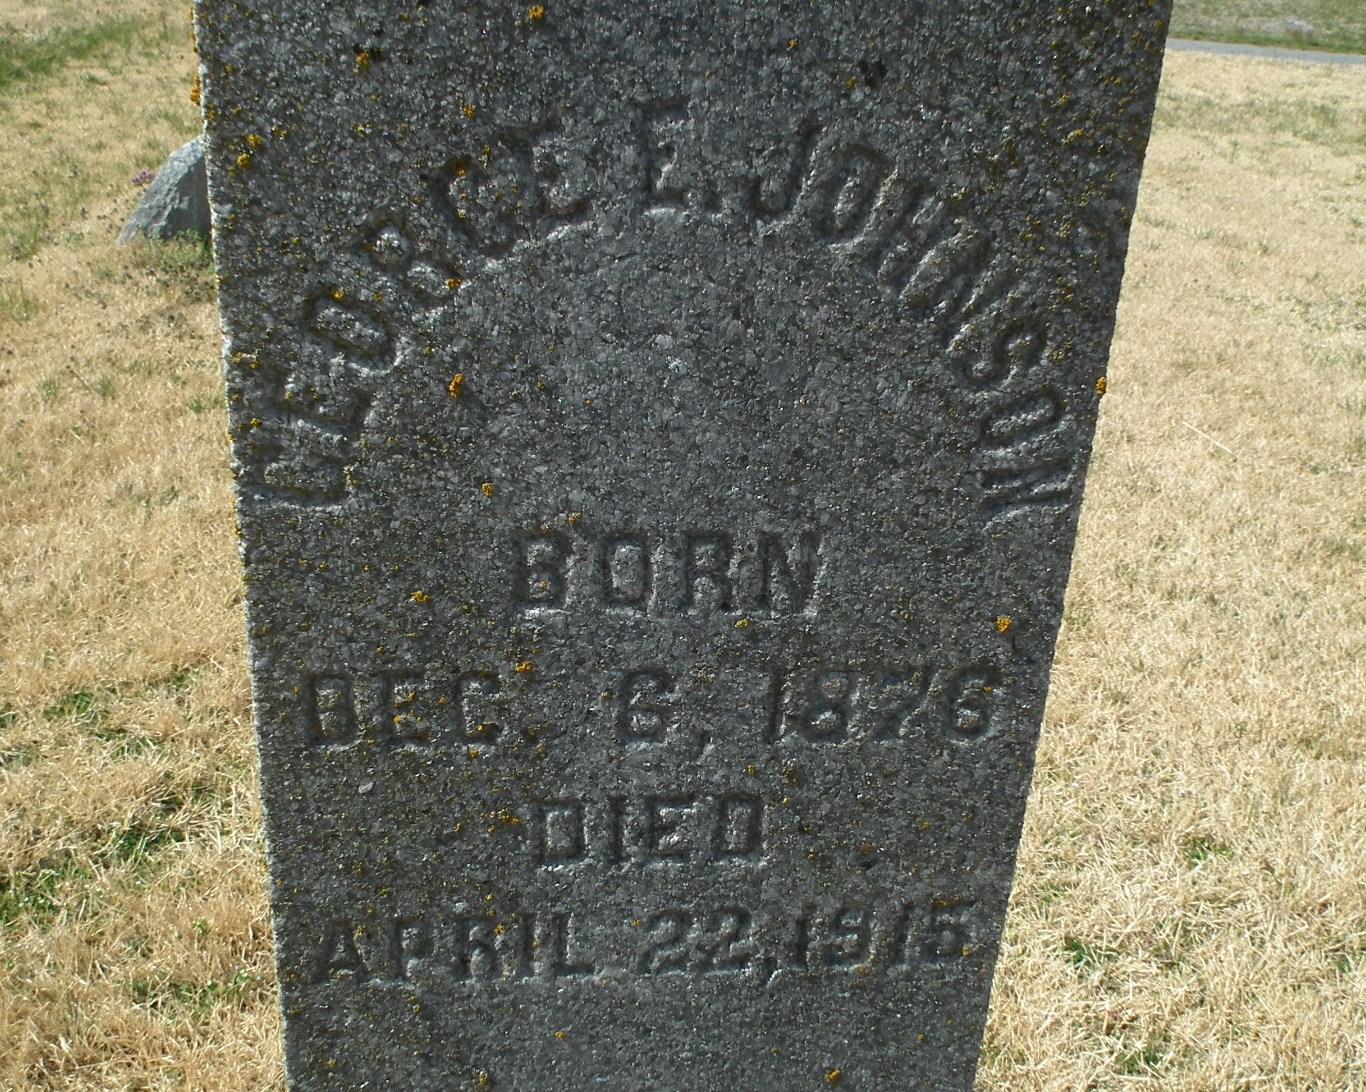 Special Policeman George E. Johnson | Philadelphia, Baltimore and Washington Railroad Police Department, Railroad Police